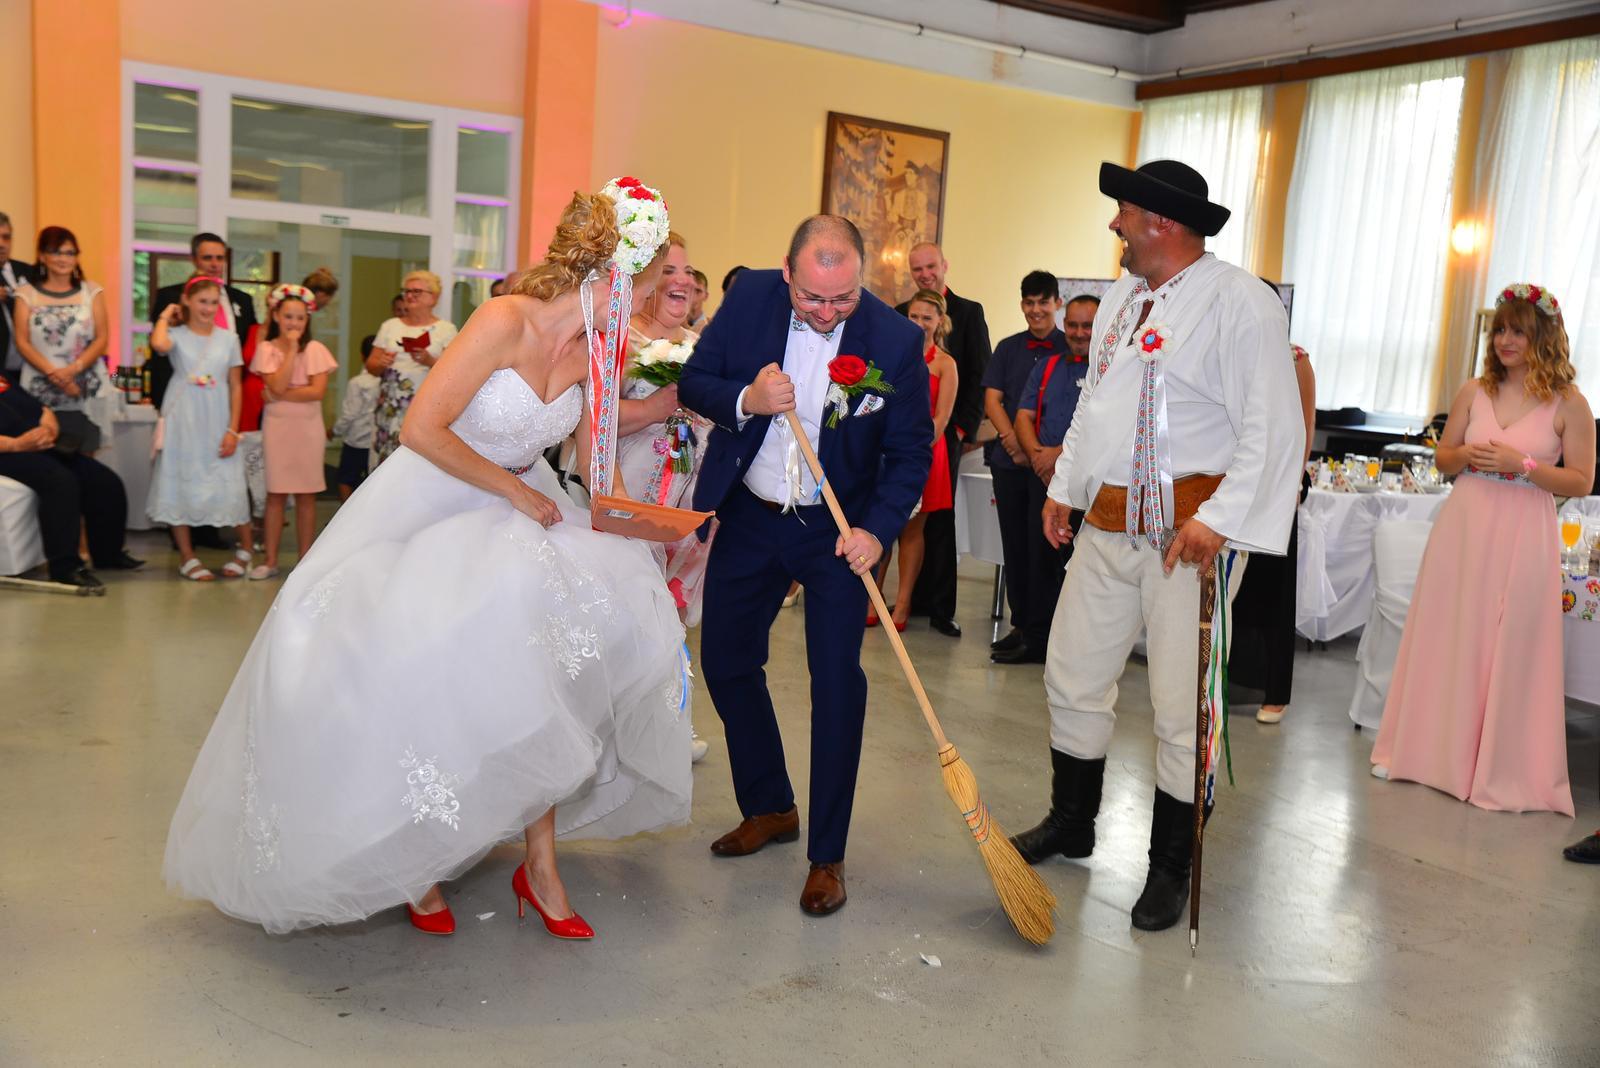 Folklorna svadba M+M, 24.8.2019 Turany - Folklorna svadba M+M, 24.8.2019 Turany, autor Foto: Multimediálny DJ Maroš Chvojka 011